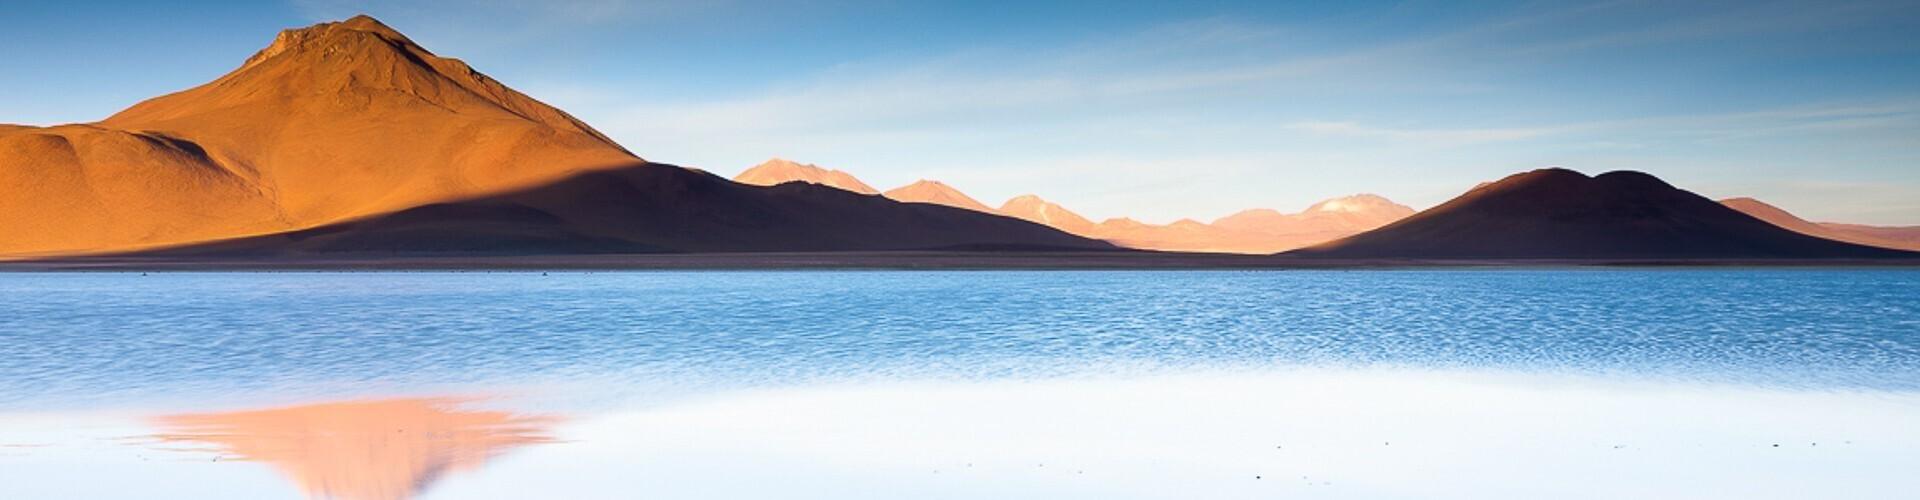 voyage photo bolivie-chili jean michel lenoir header